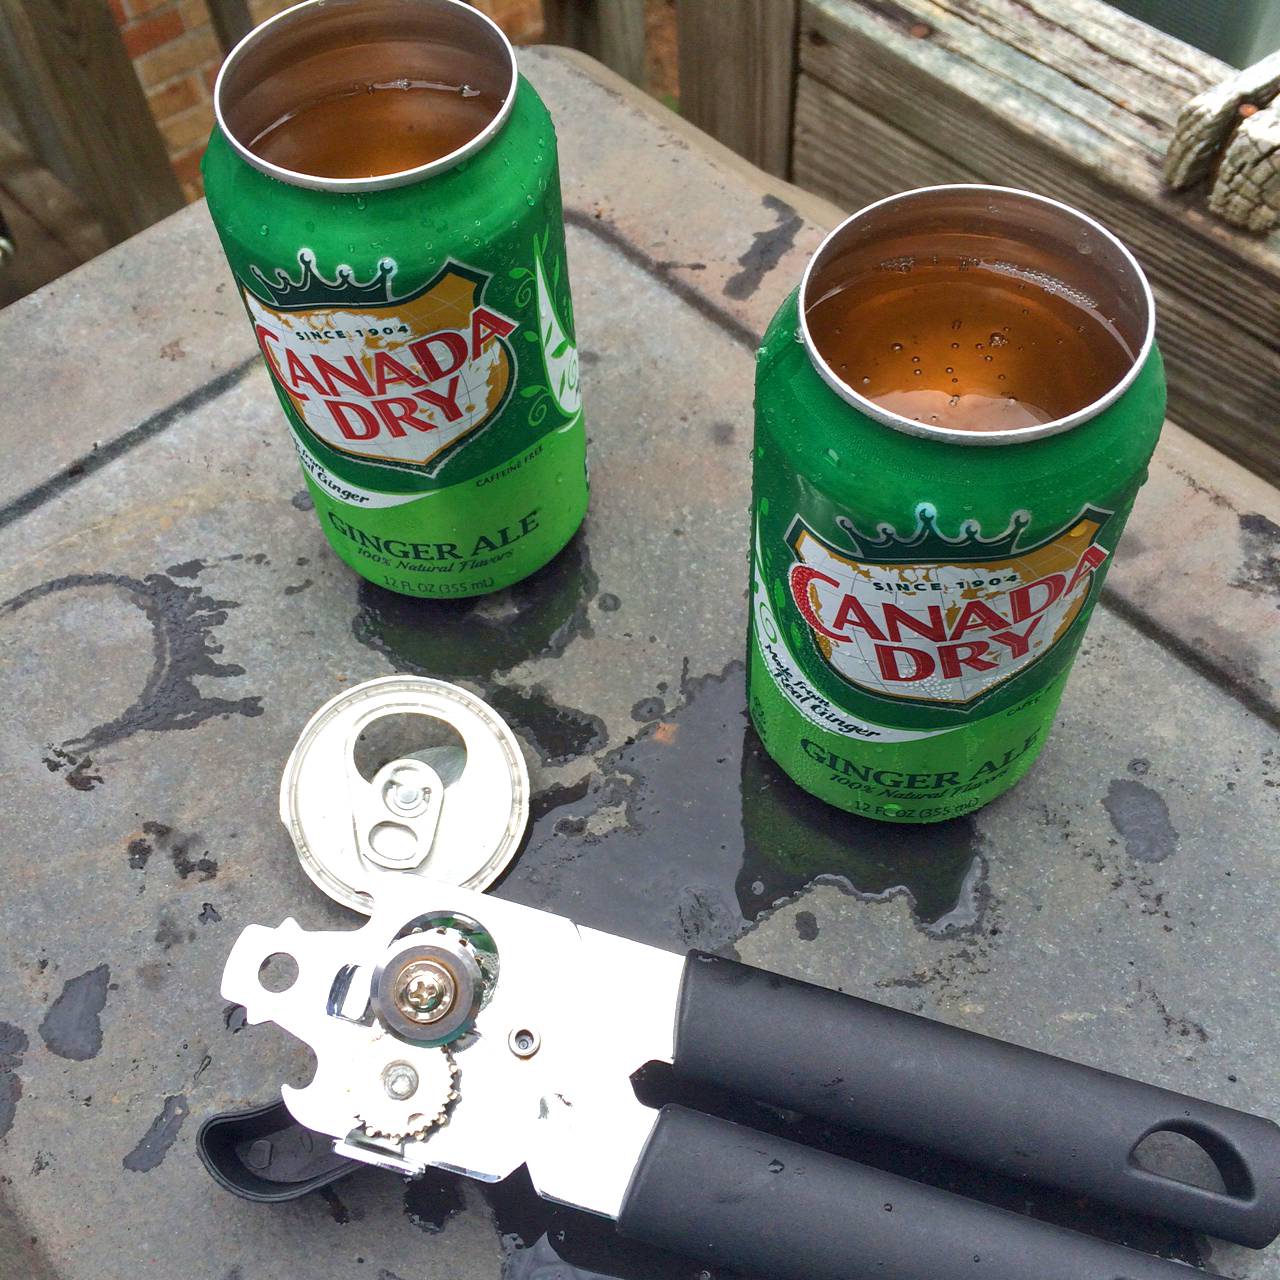 ginger-ale-cans.jpg